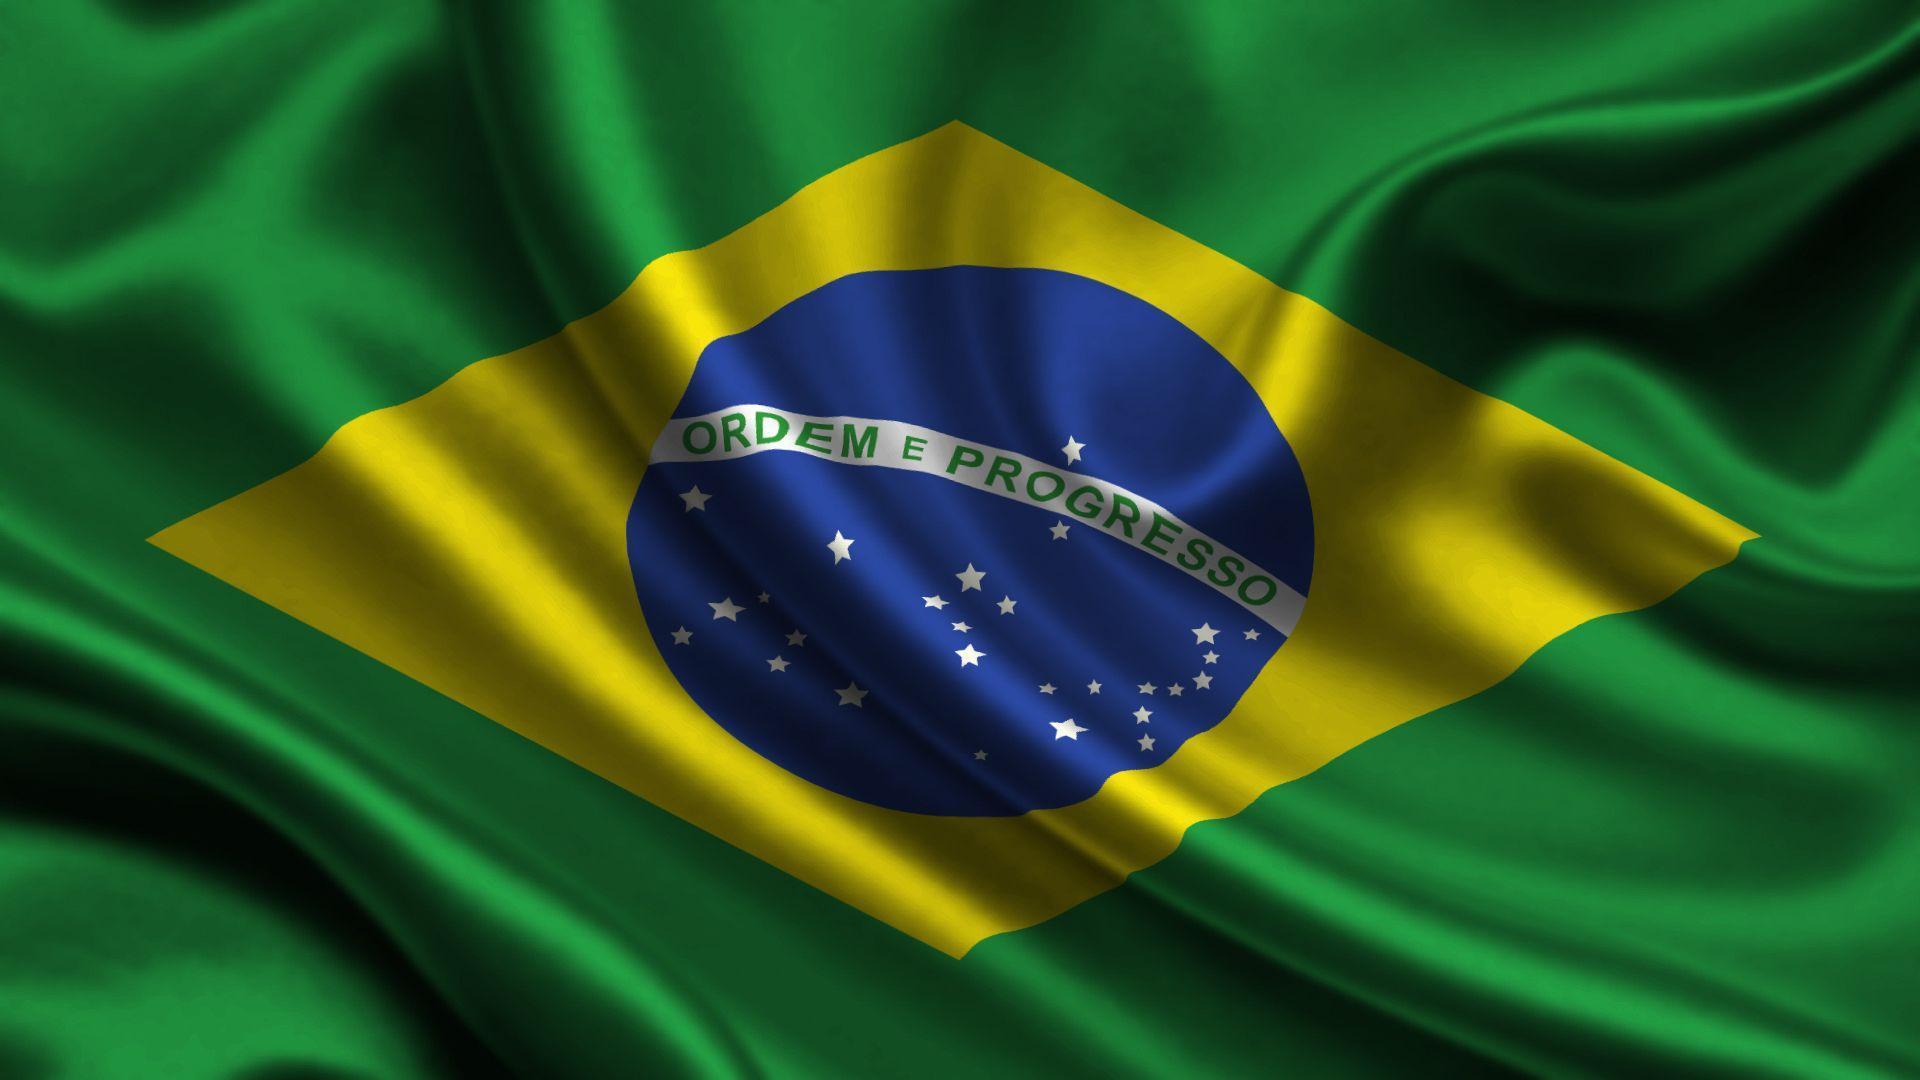 brazil - پلیس برزیل 33 میلیون دلار در جریان پولشویی با کریپتو کشف و ضبط کرد